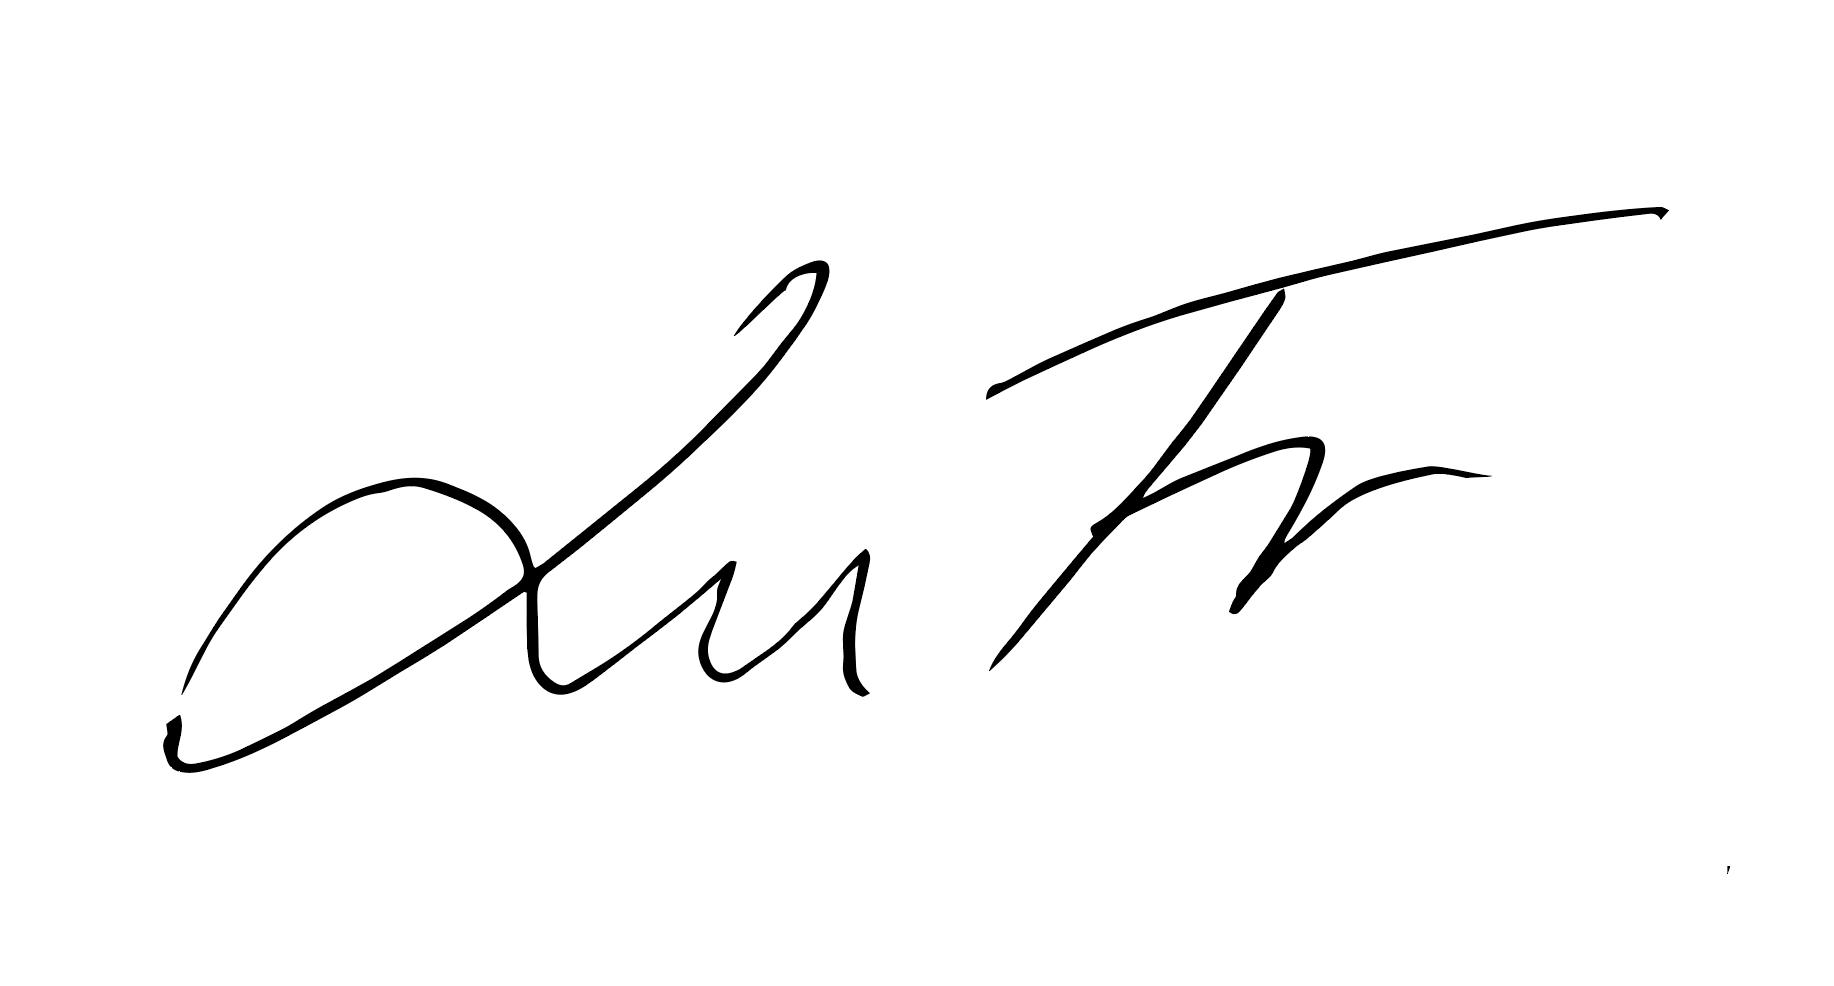 Lucie FrYDLOVA's Signature